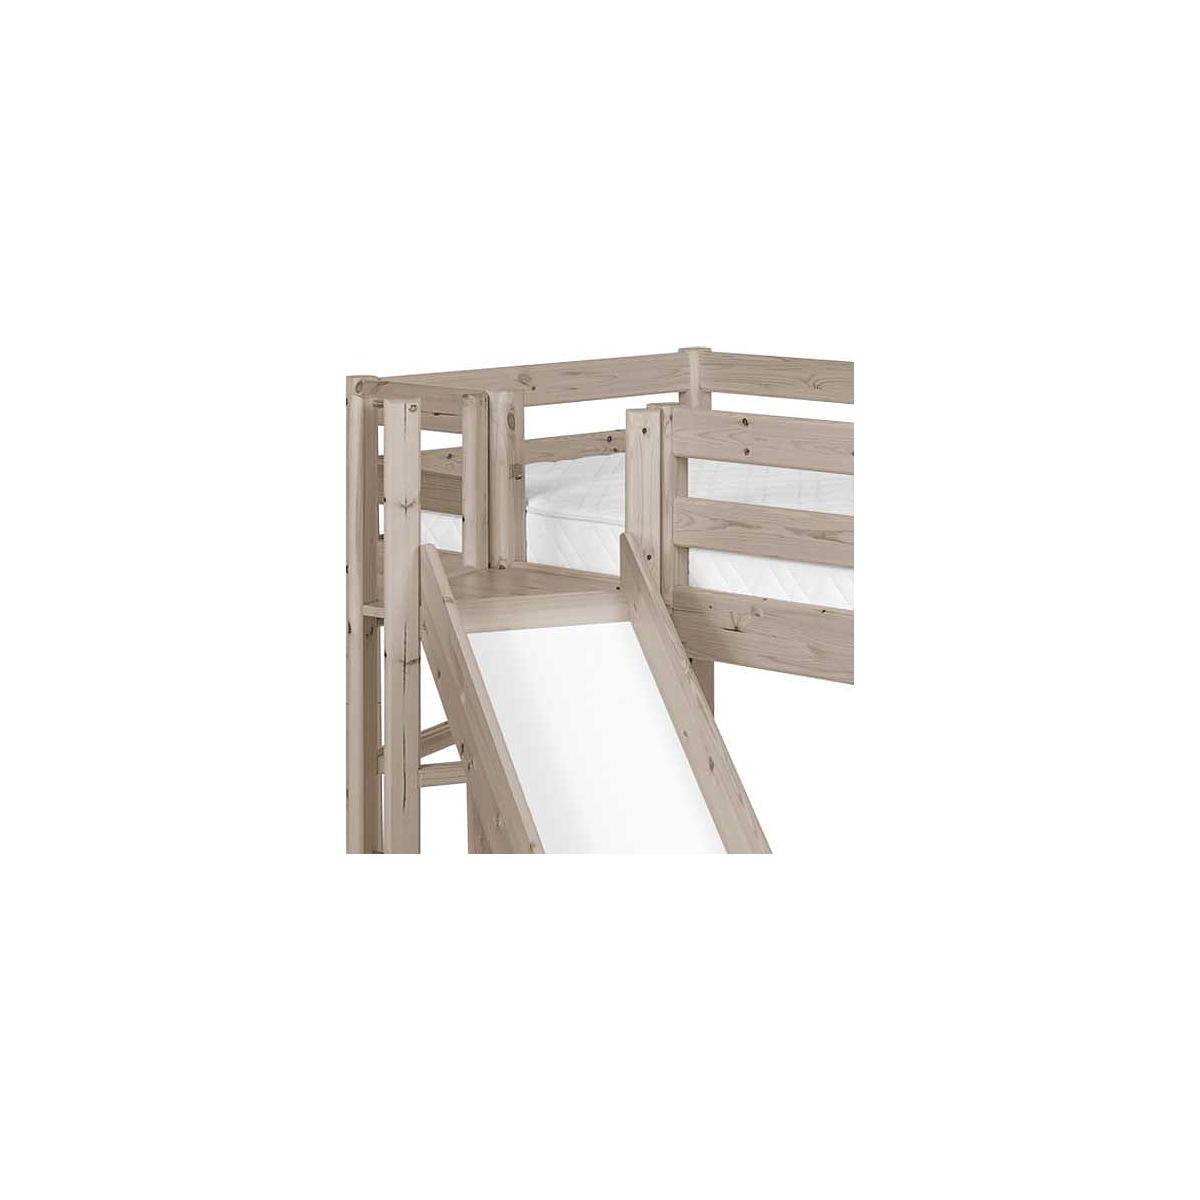 Cama media alta 90x200 CLASSIC Flexa plataforma y tobogán terra